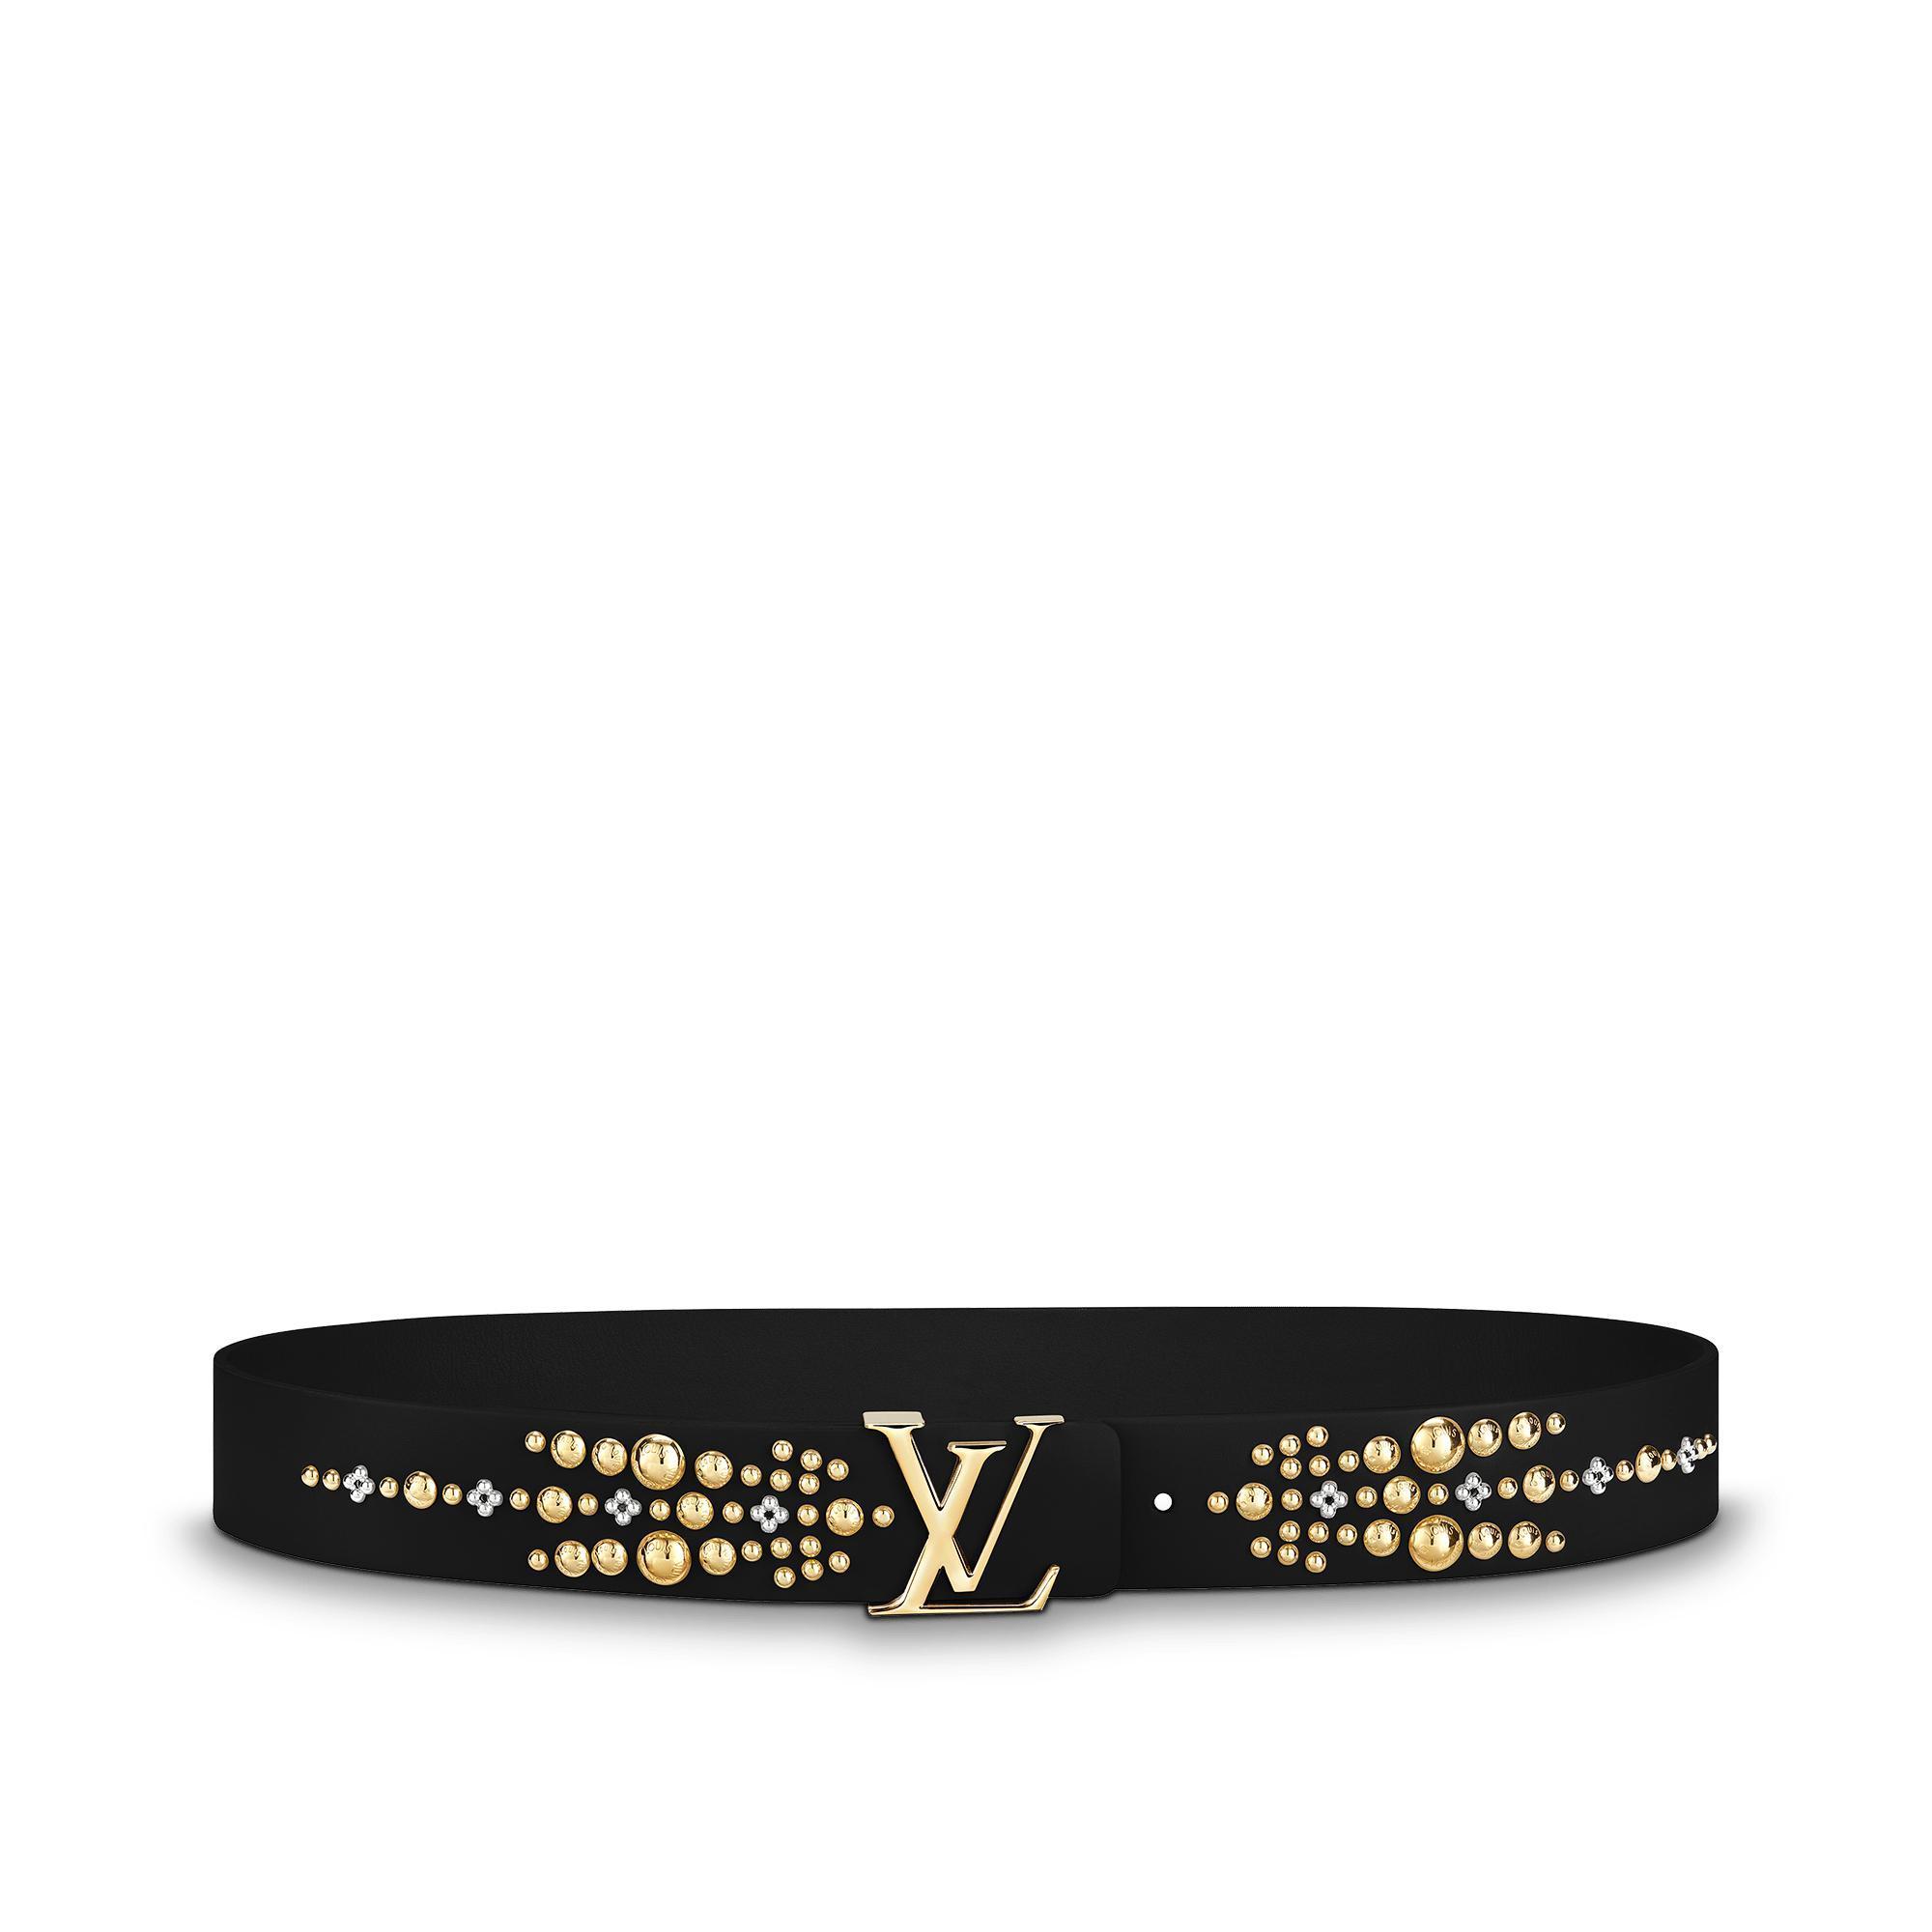 Lv Iconic 35Mm Belt, Black